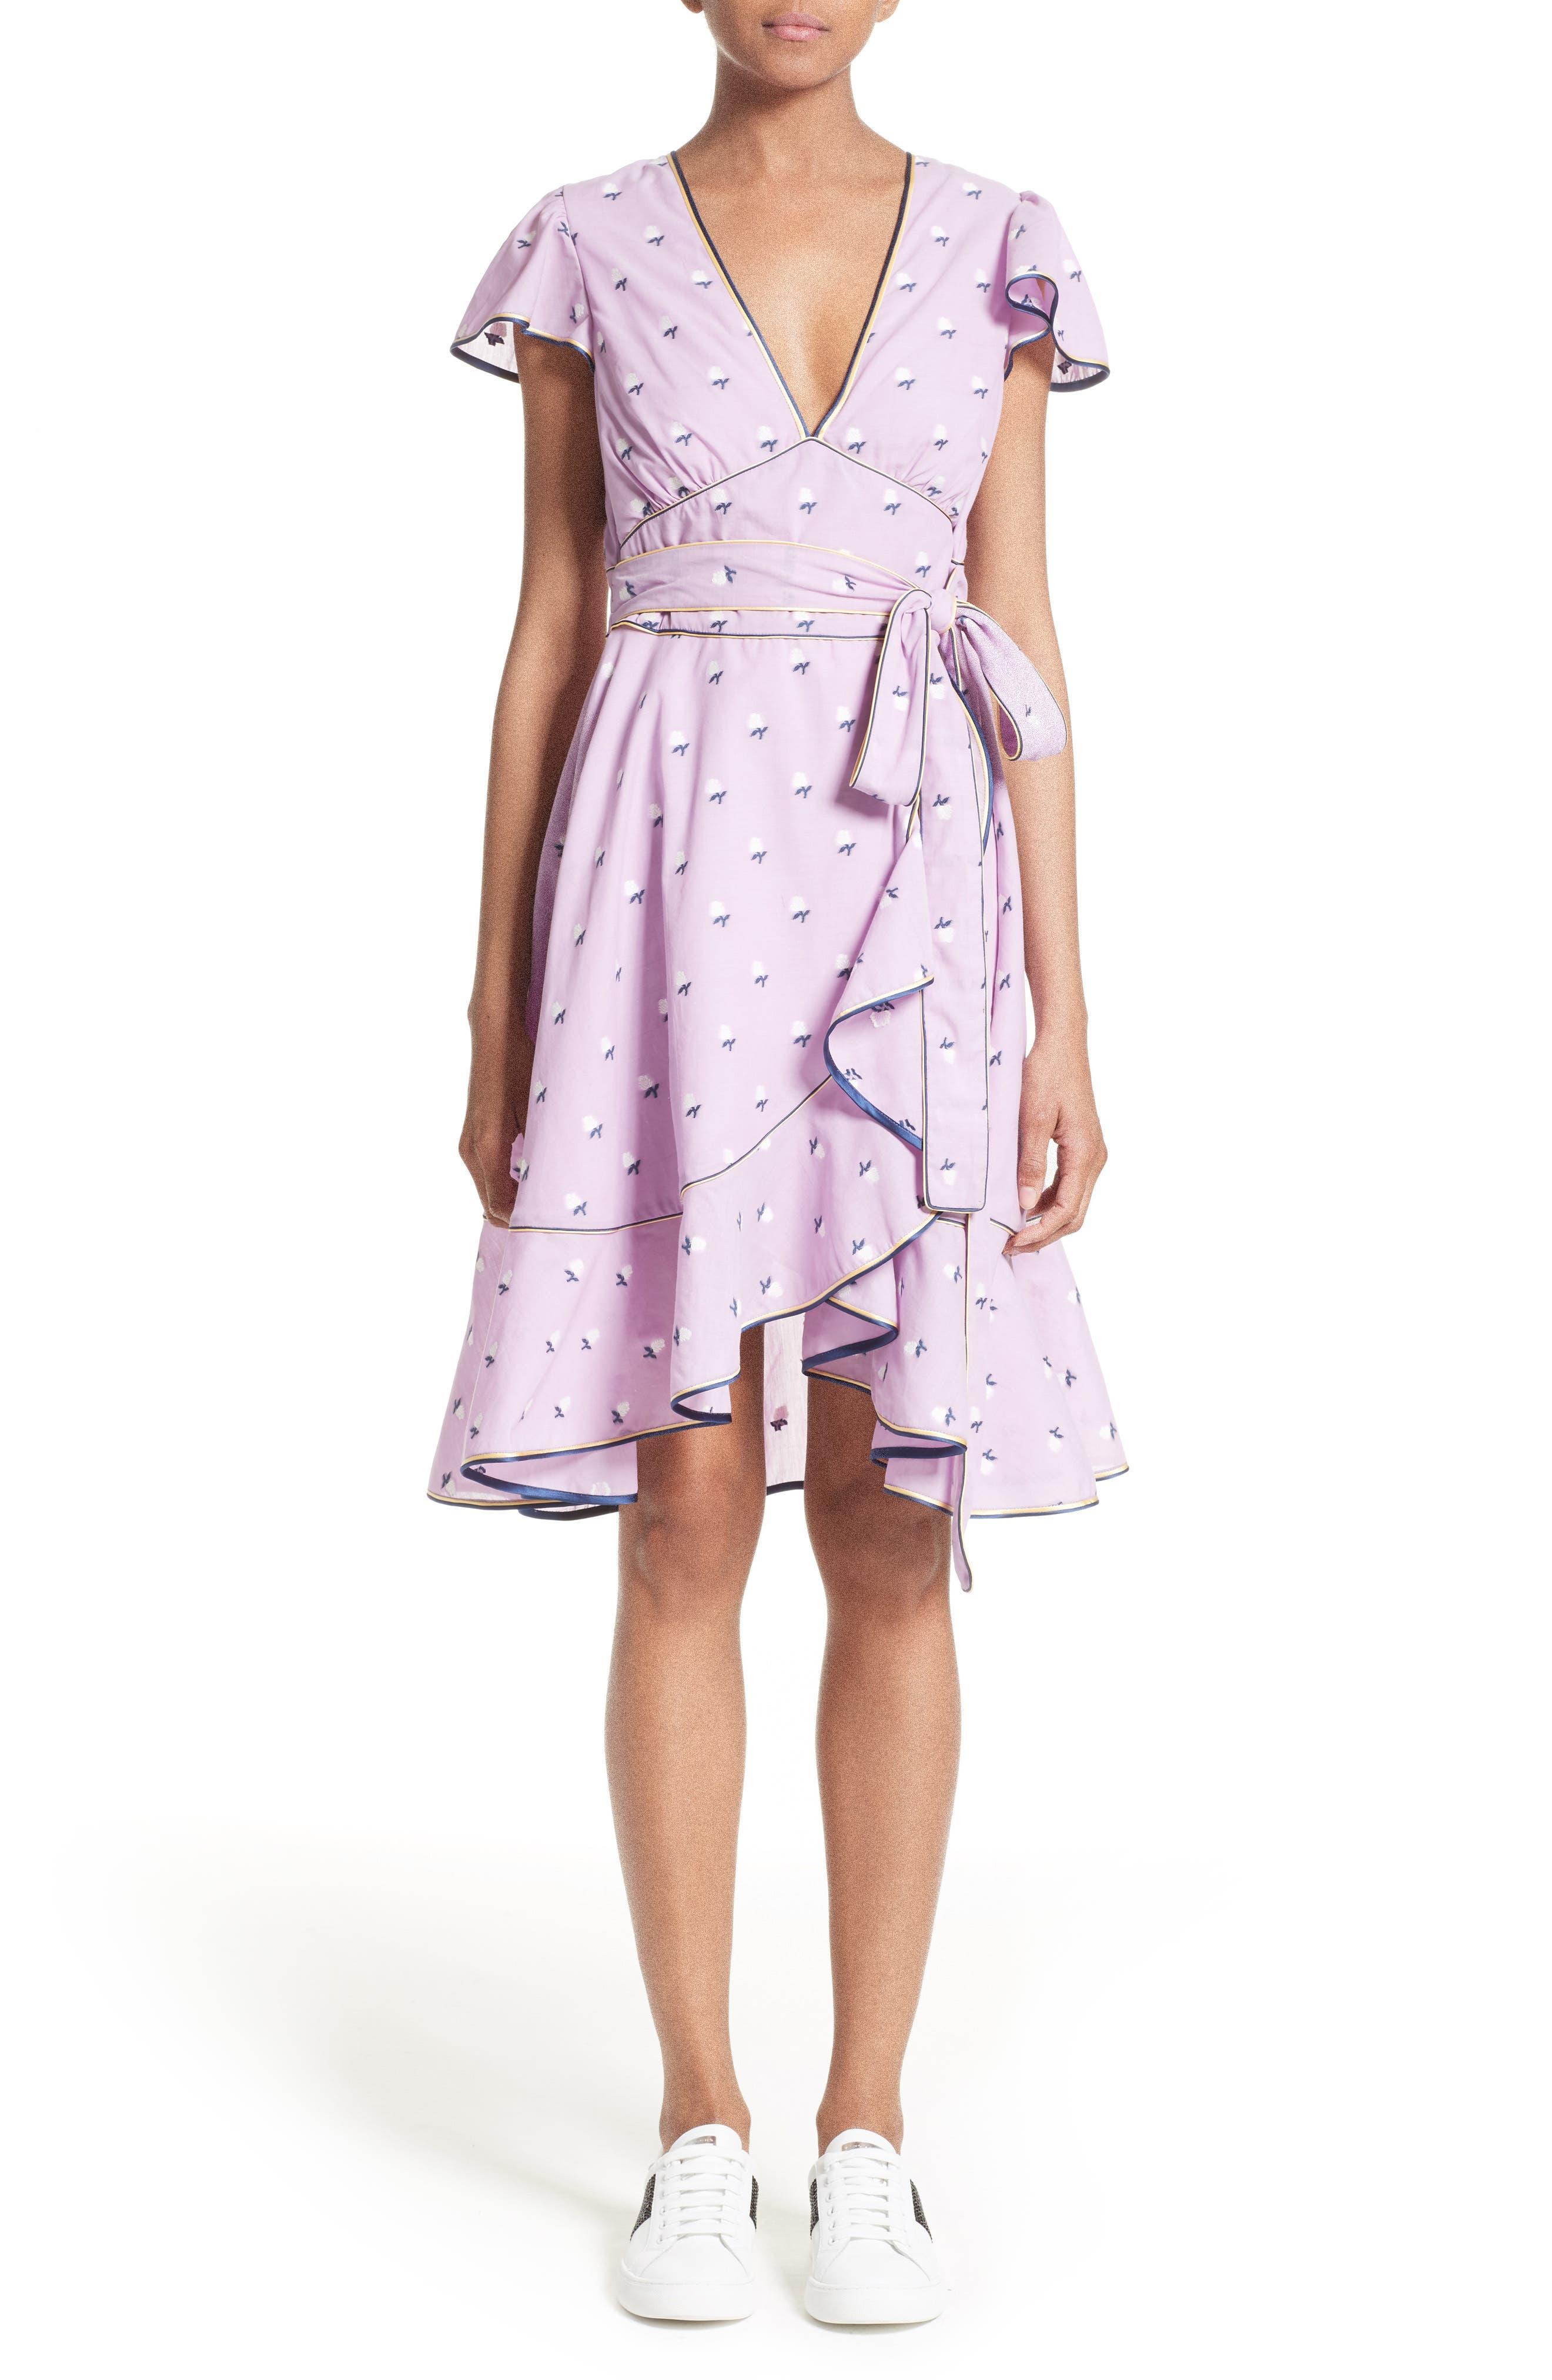 Alternate Image 1 Selected - MARC JACOBS Ruffle Reverse Fil Coupé Dress